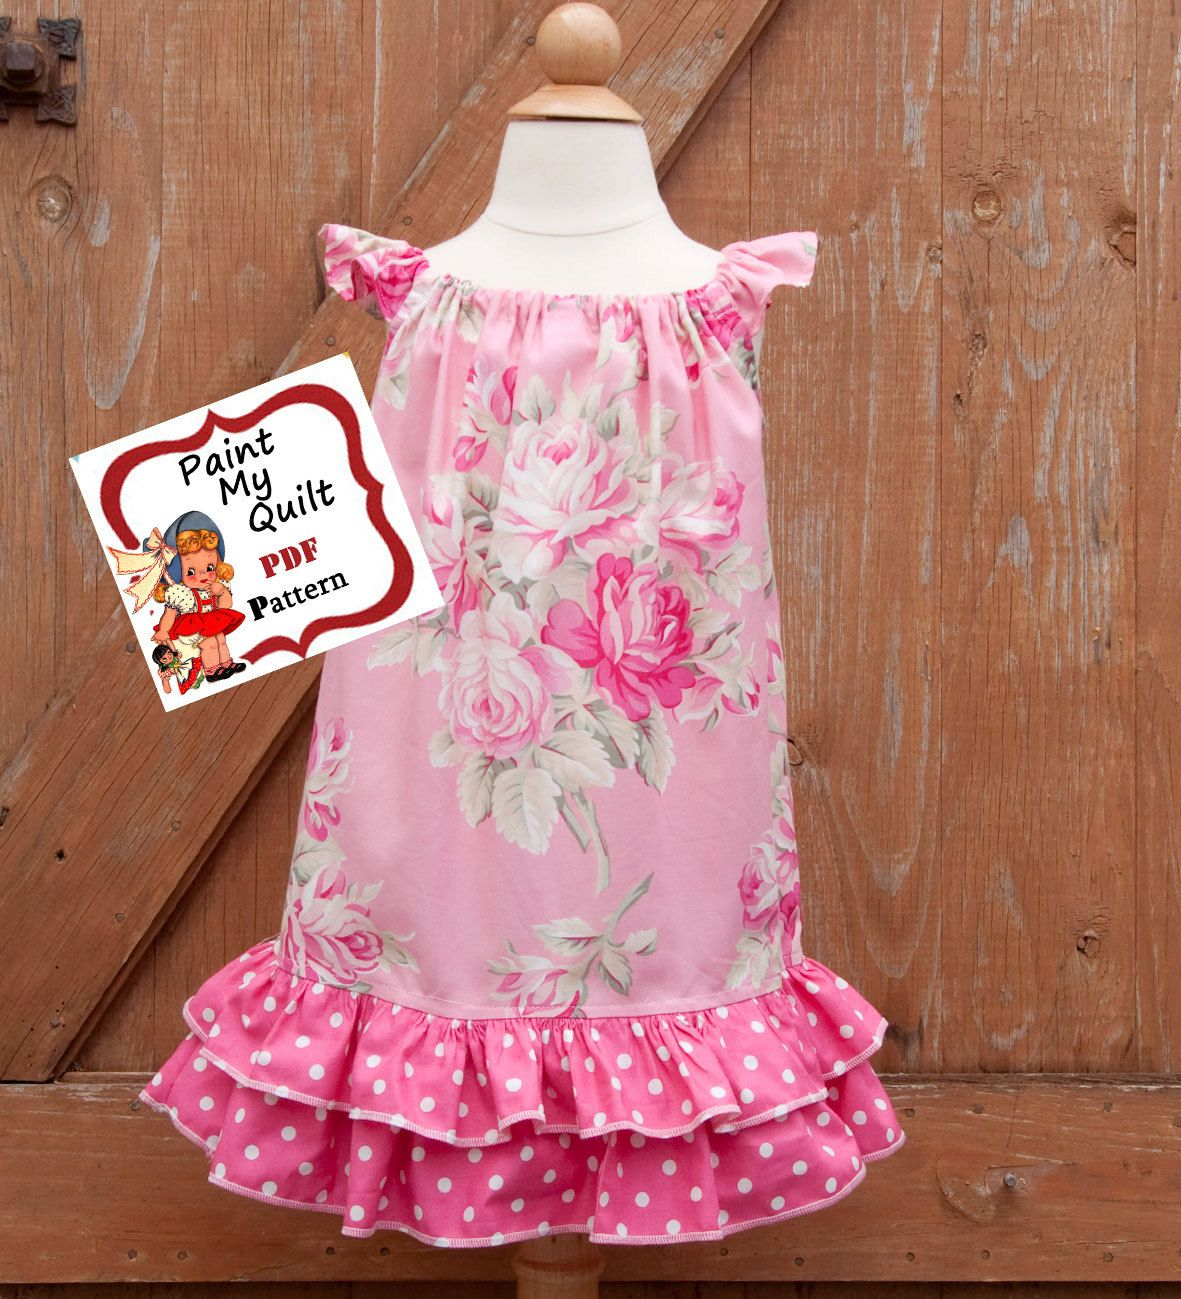 INSTANT DOWNLOAD Girls Dress Pattern PDF Pillow Case Dress Sewing ...